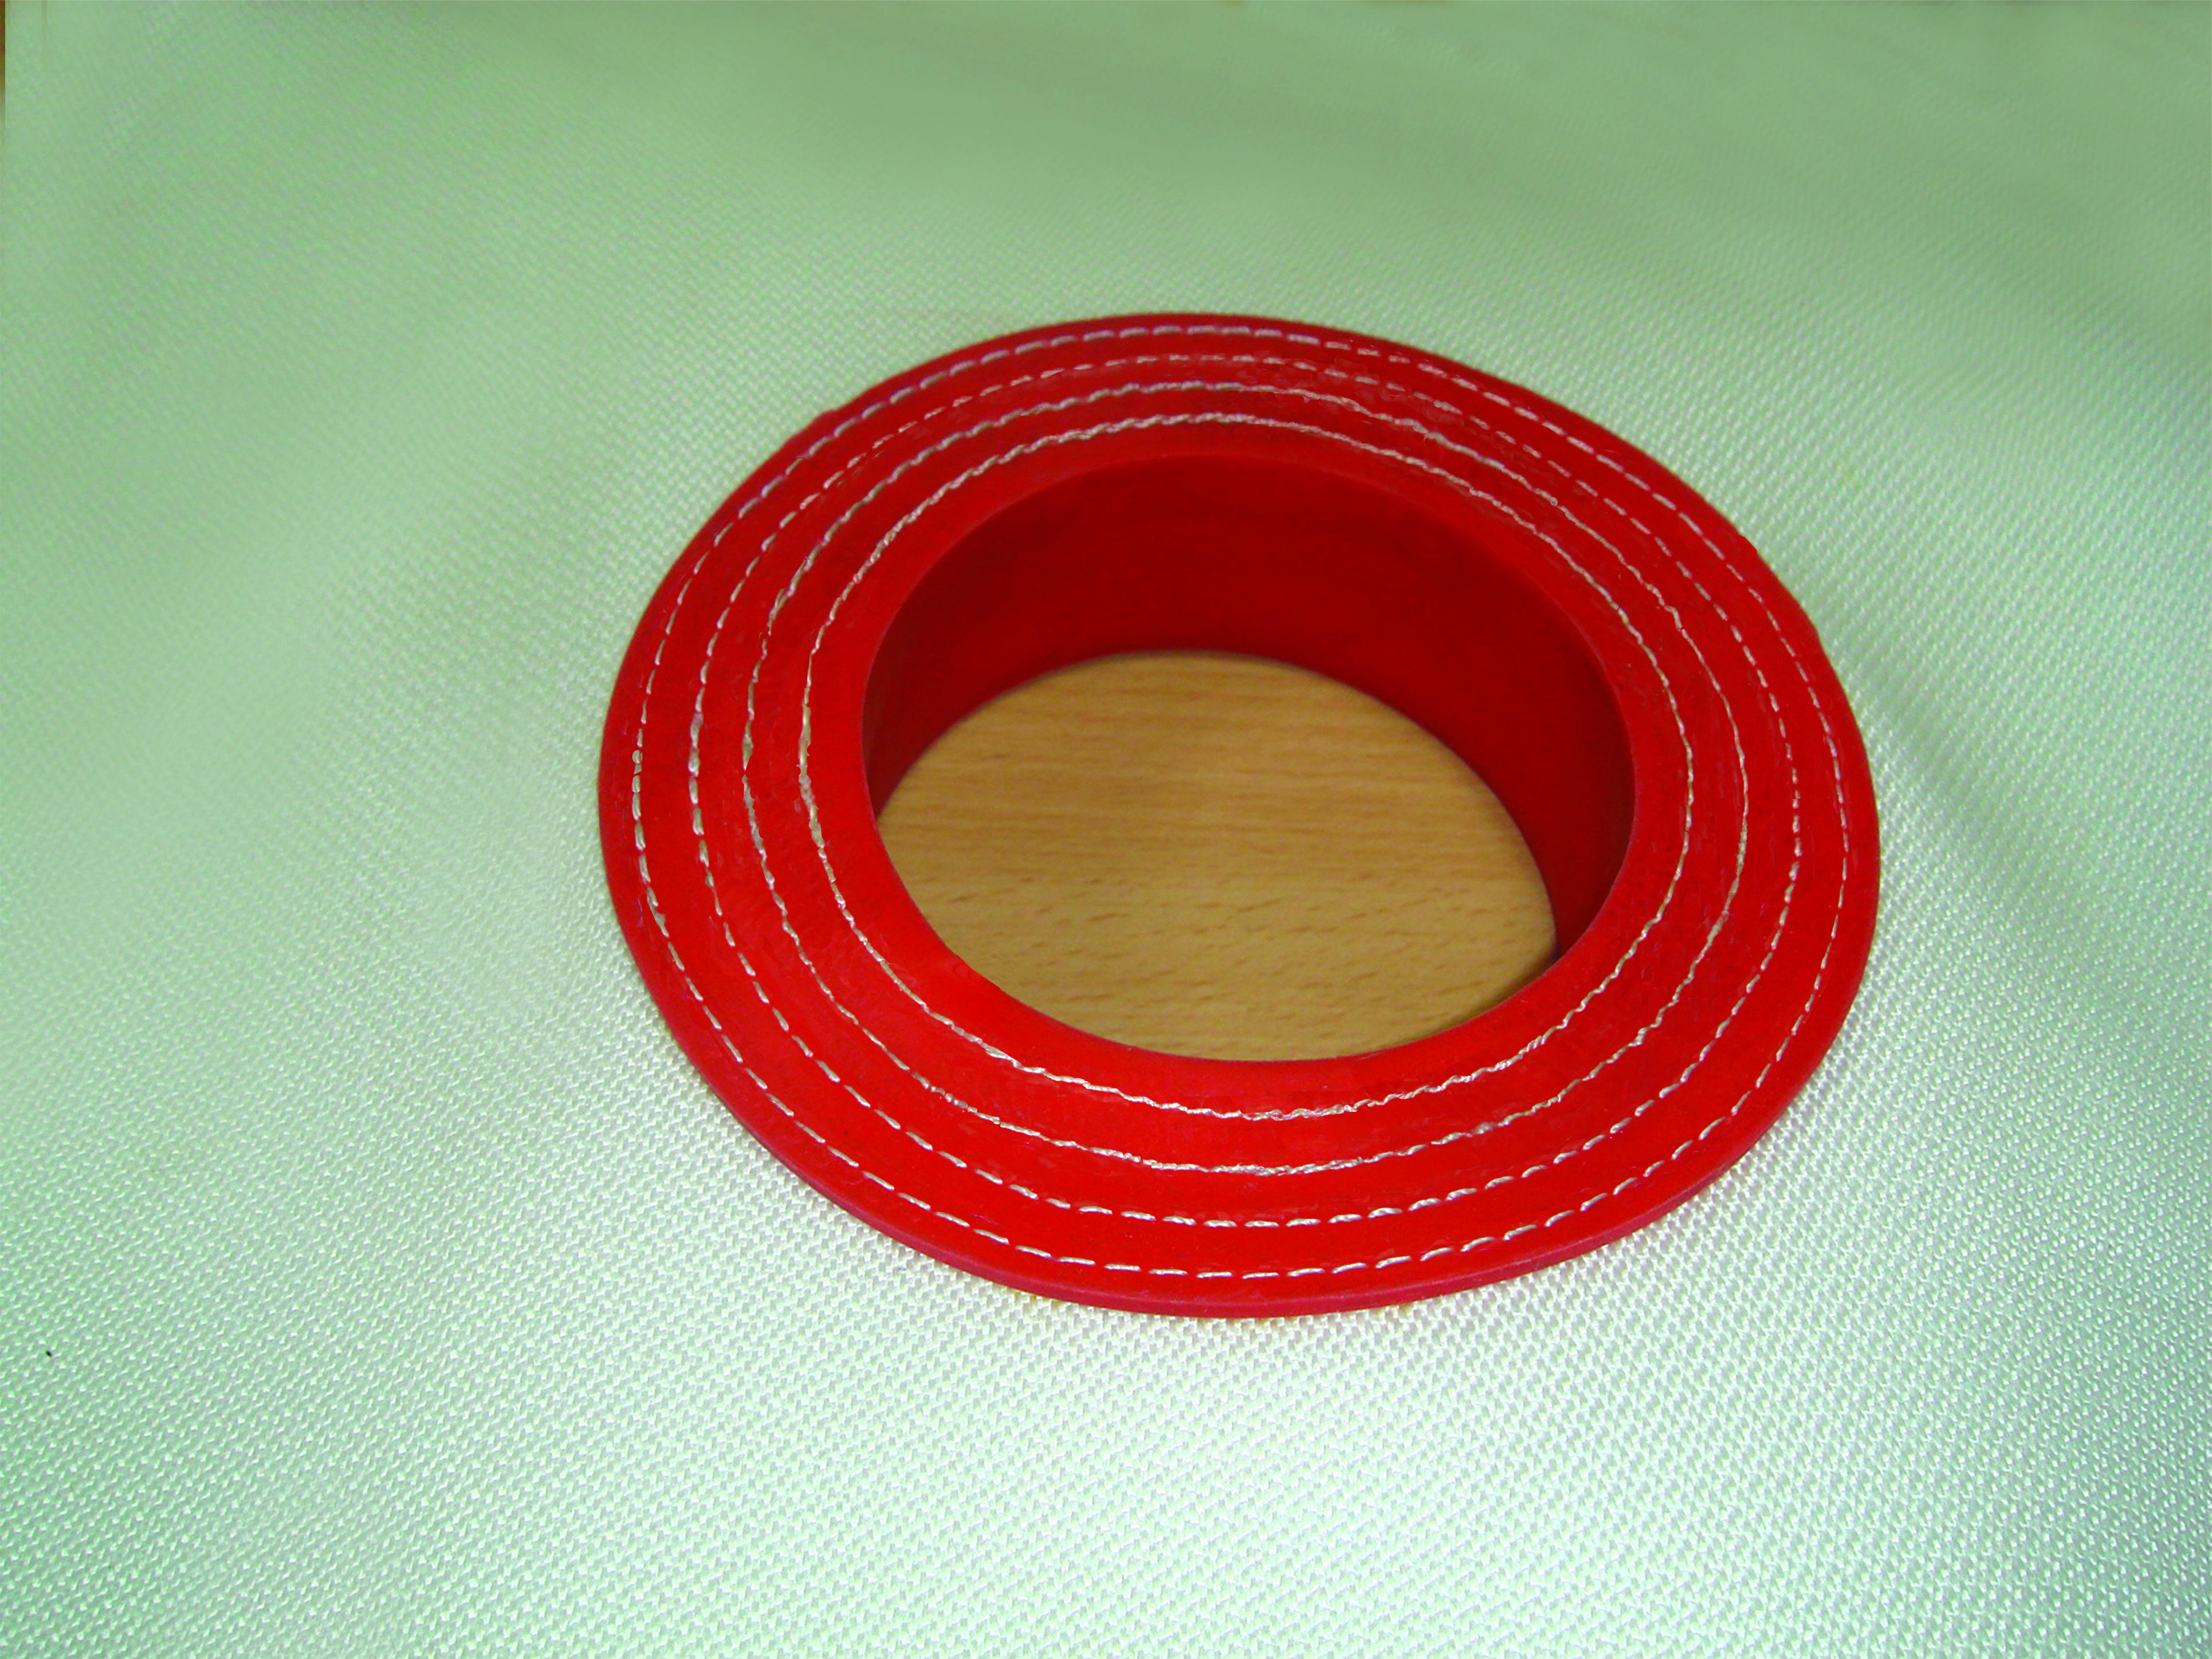 filter press BF border coated fabric madeups